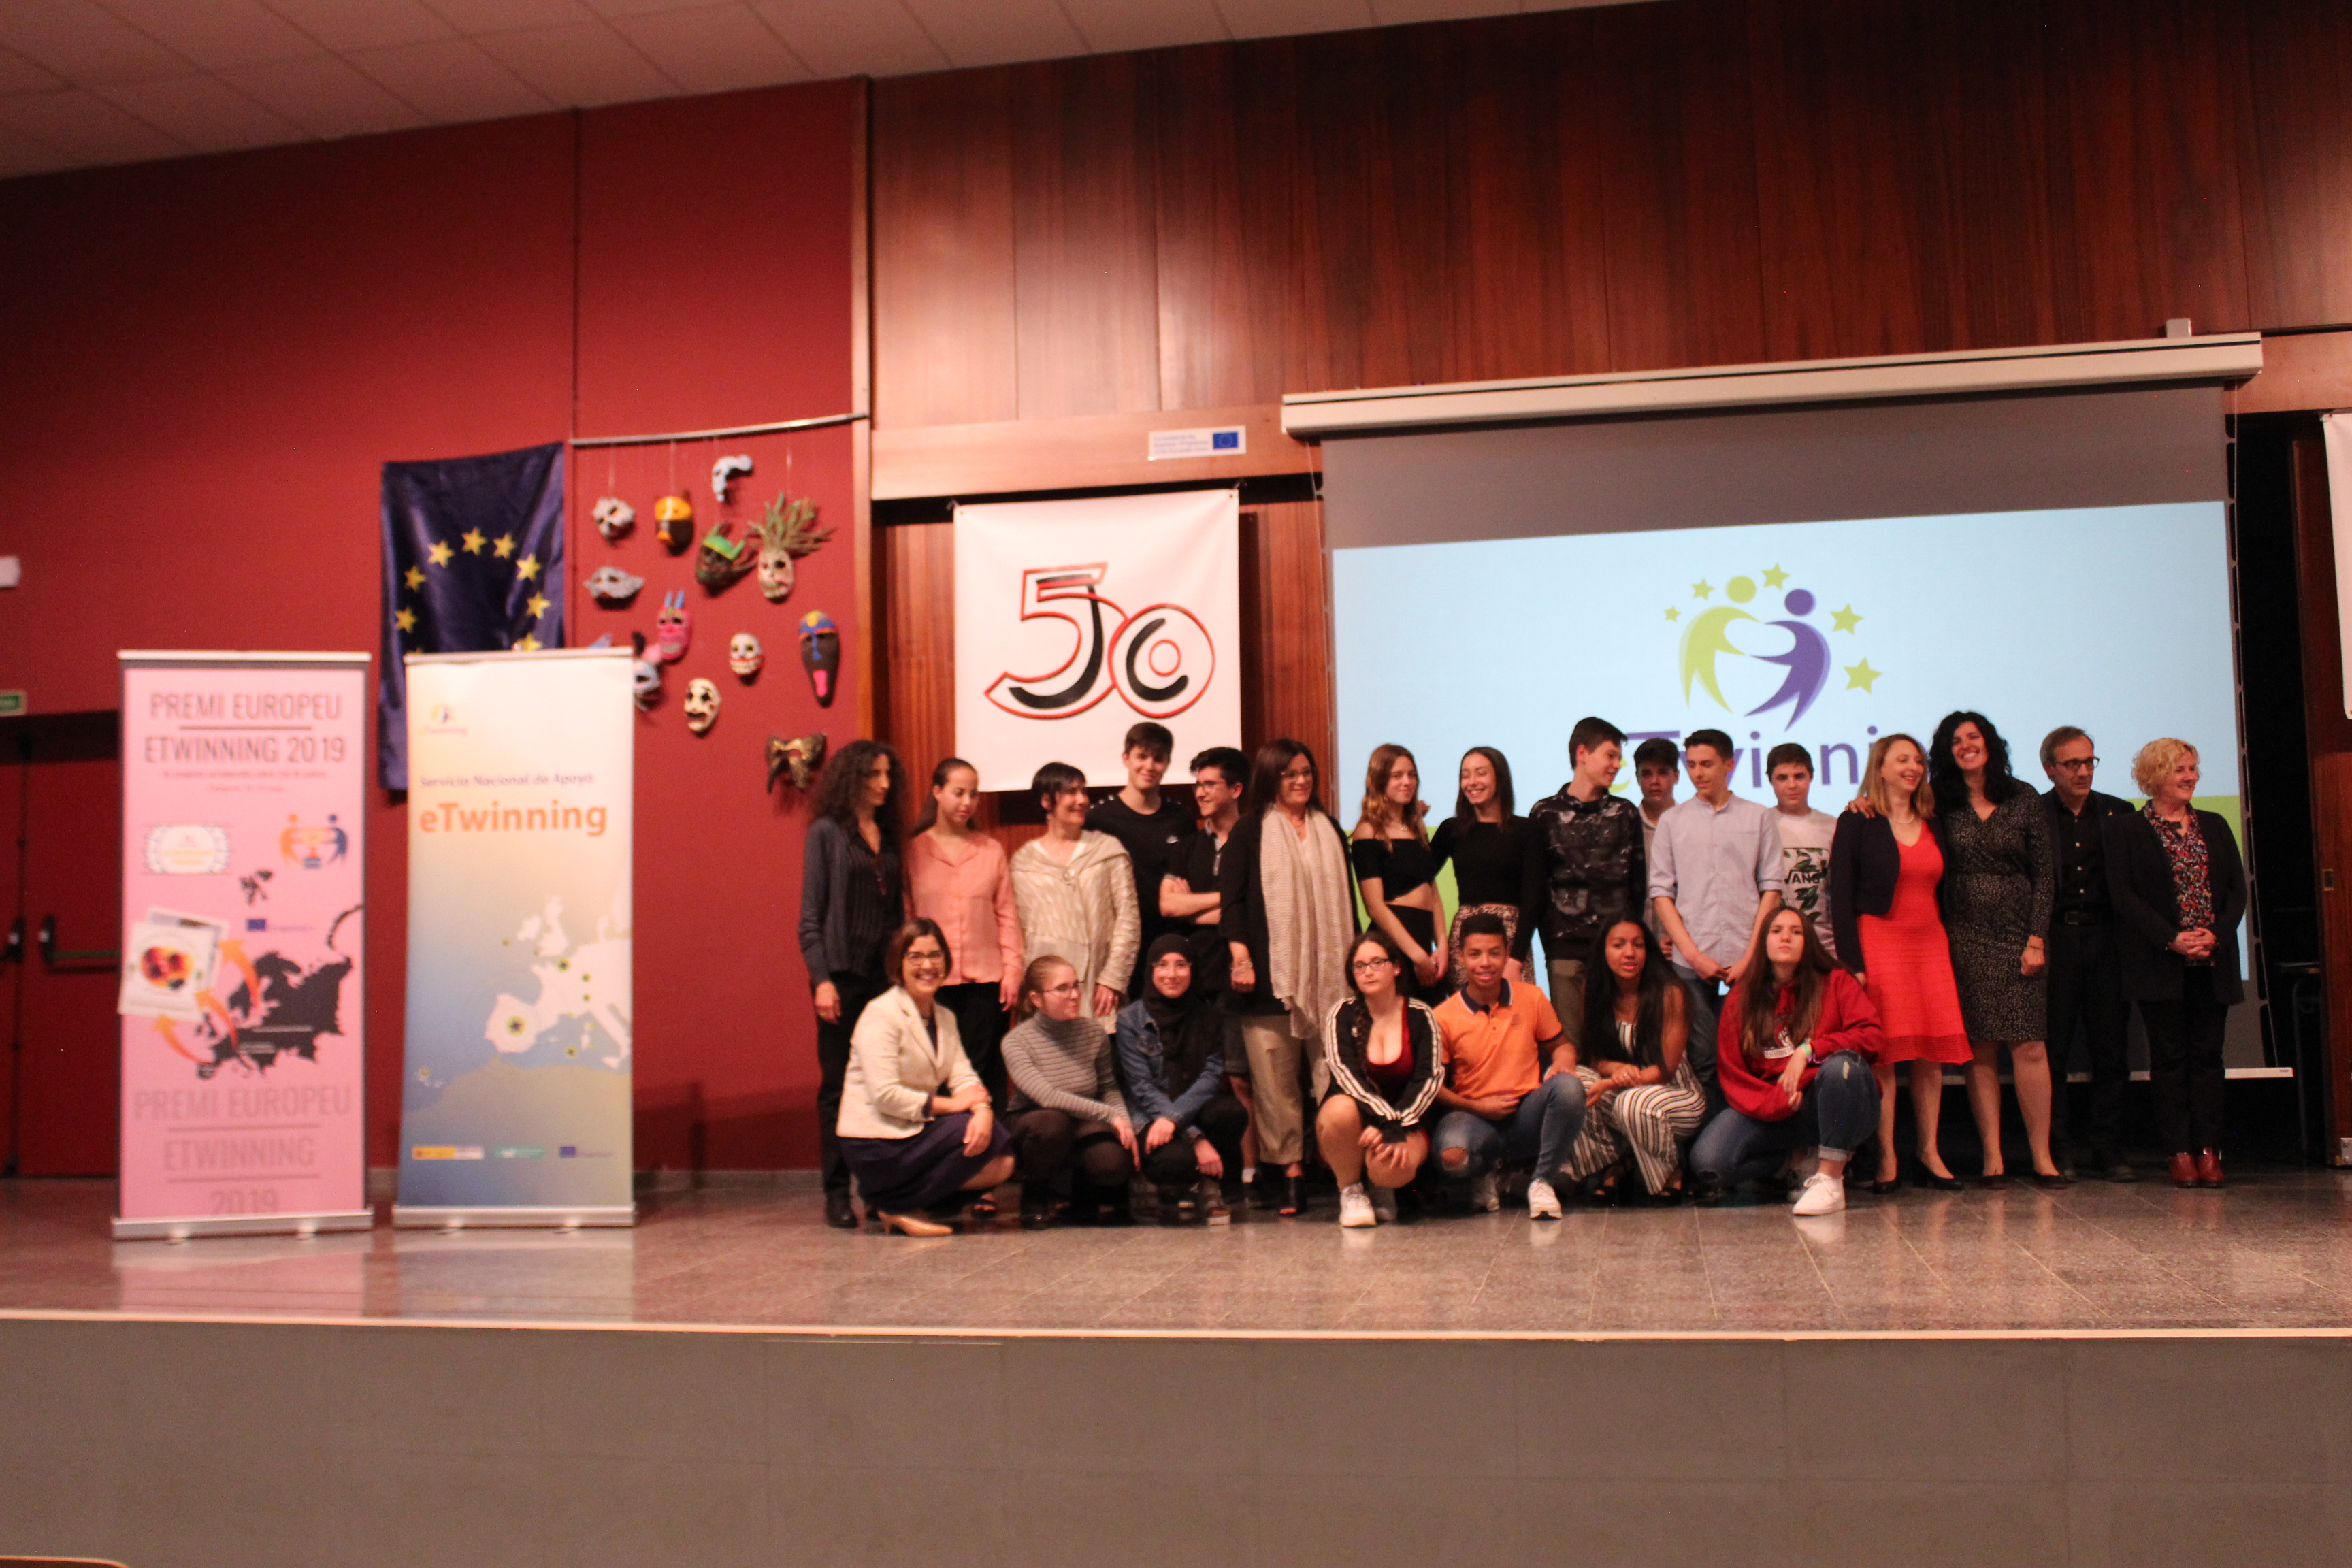 Ceremonia de entrega del Premio Europeo eTwinning